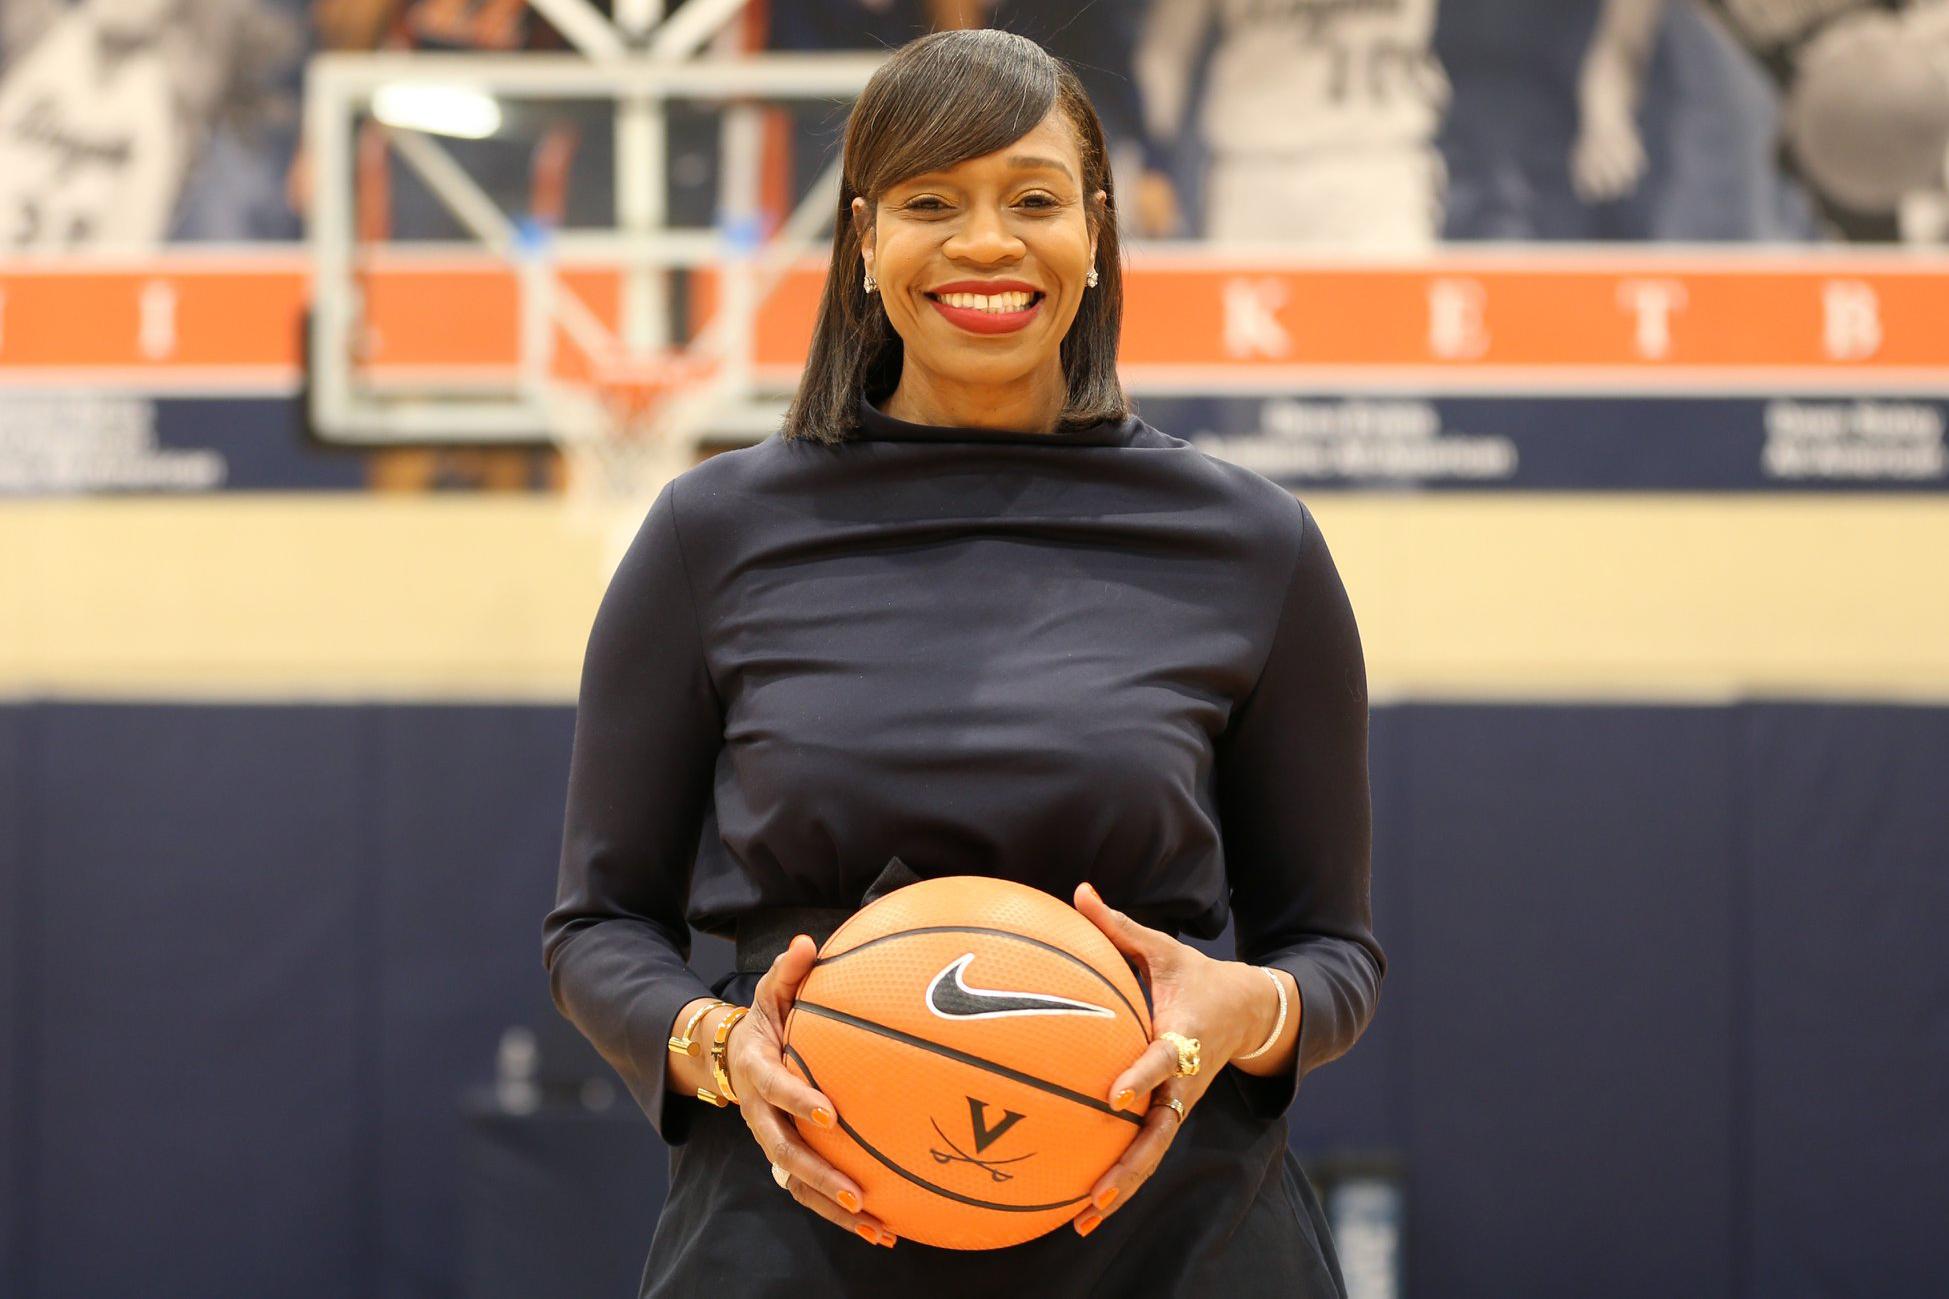 UVA's hiring of Tina Thompson earned acclaim from all across the world of women's basketball. (Photos by Matt Riley, UVA Athletics)